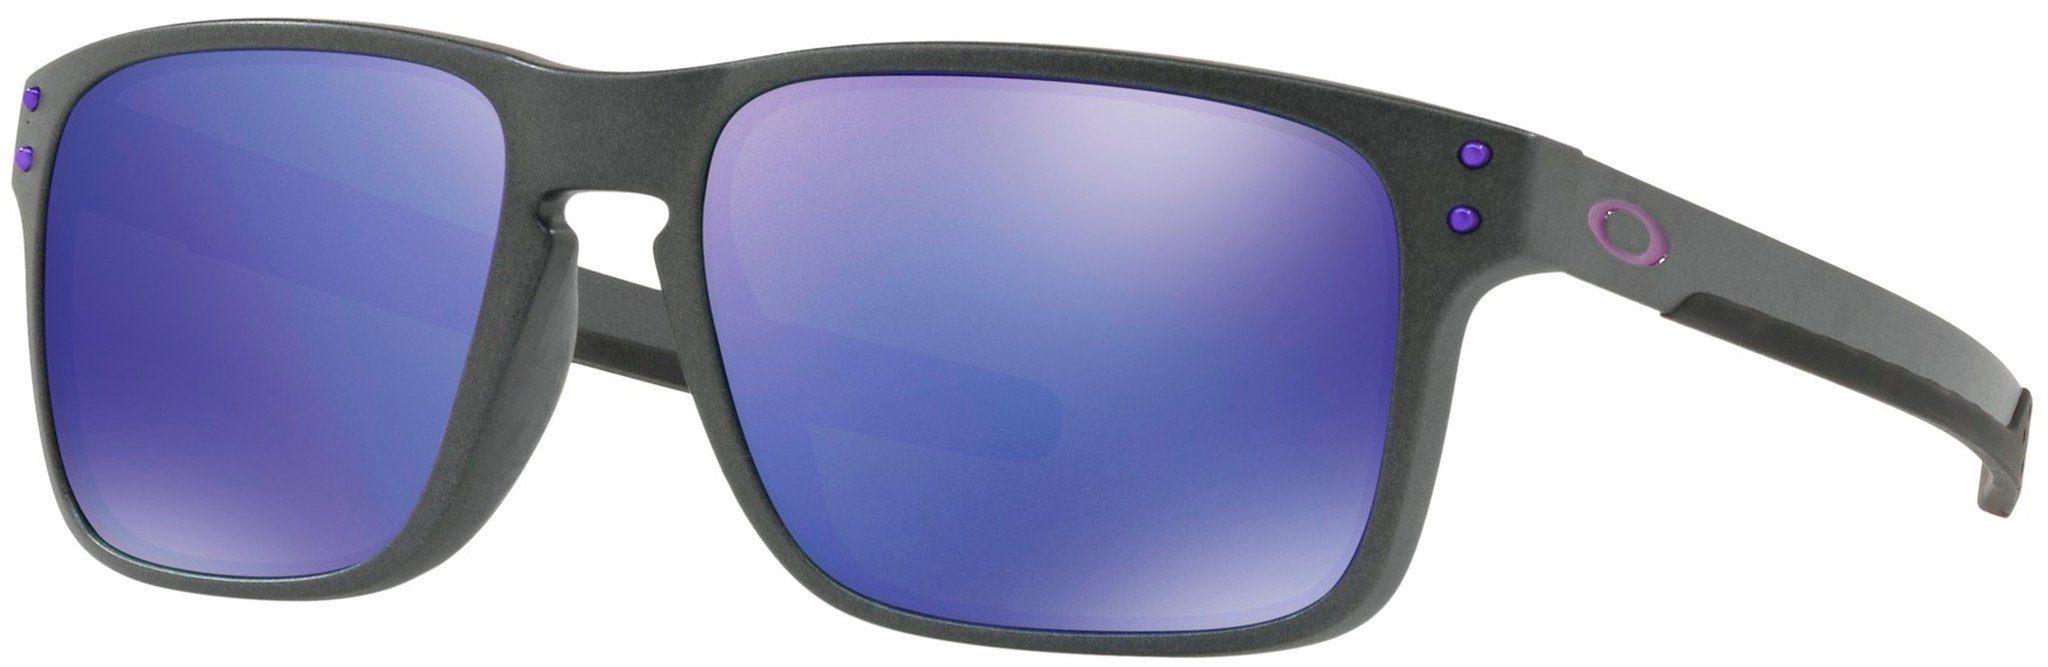 Oakley Sportbrille »Holbrook Mix Sunglasses«